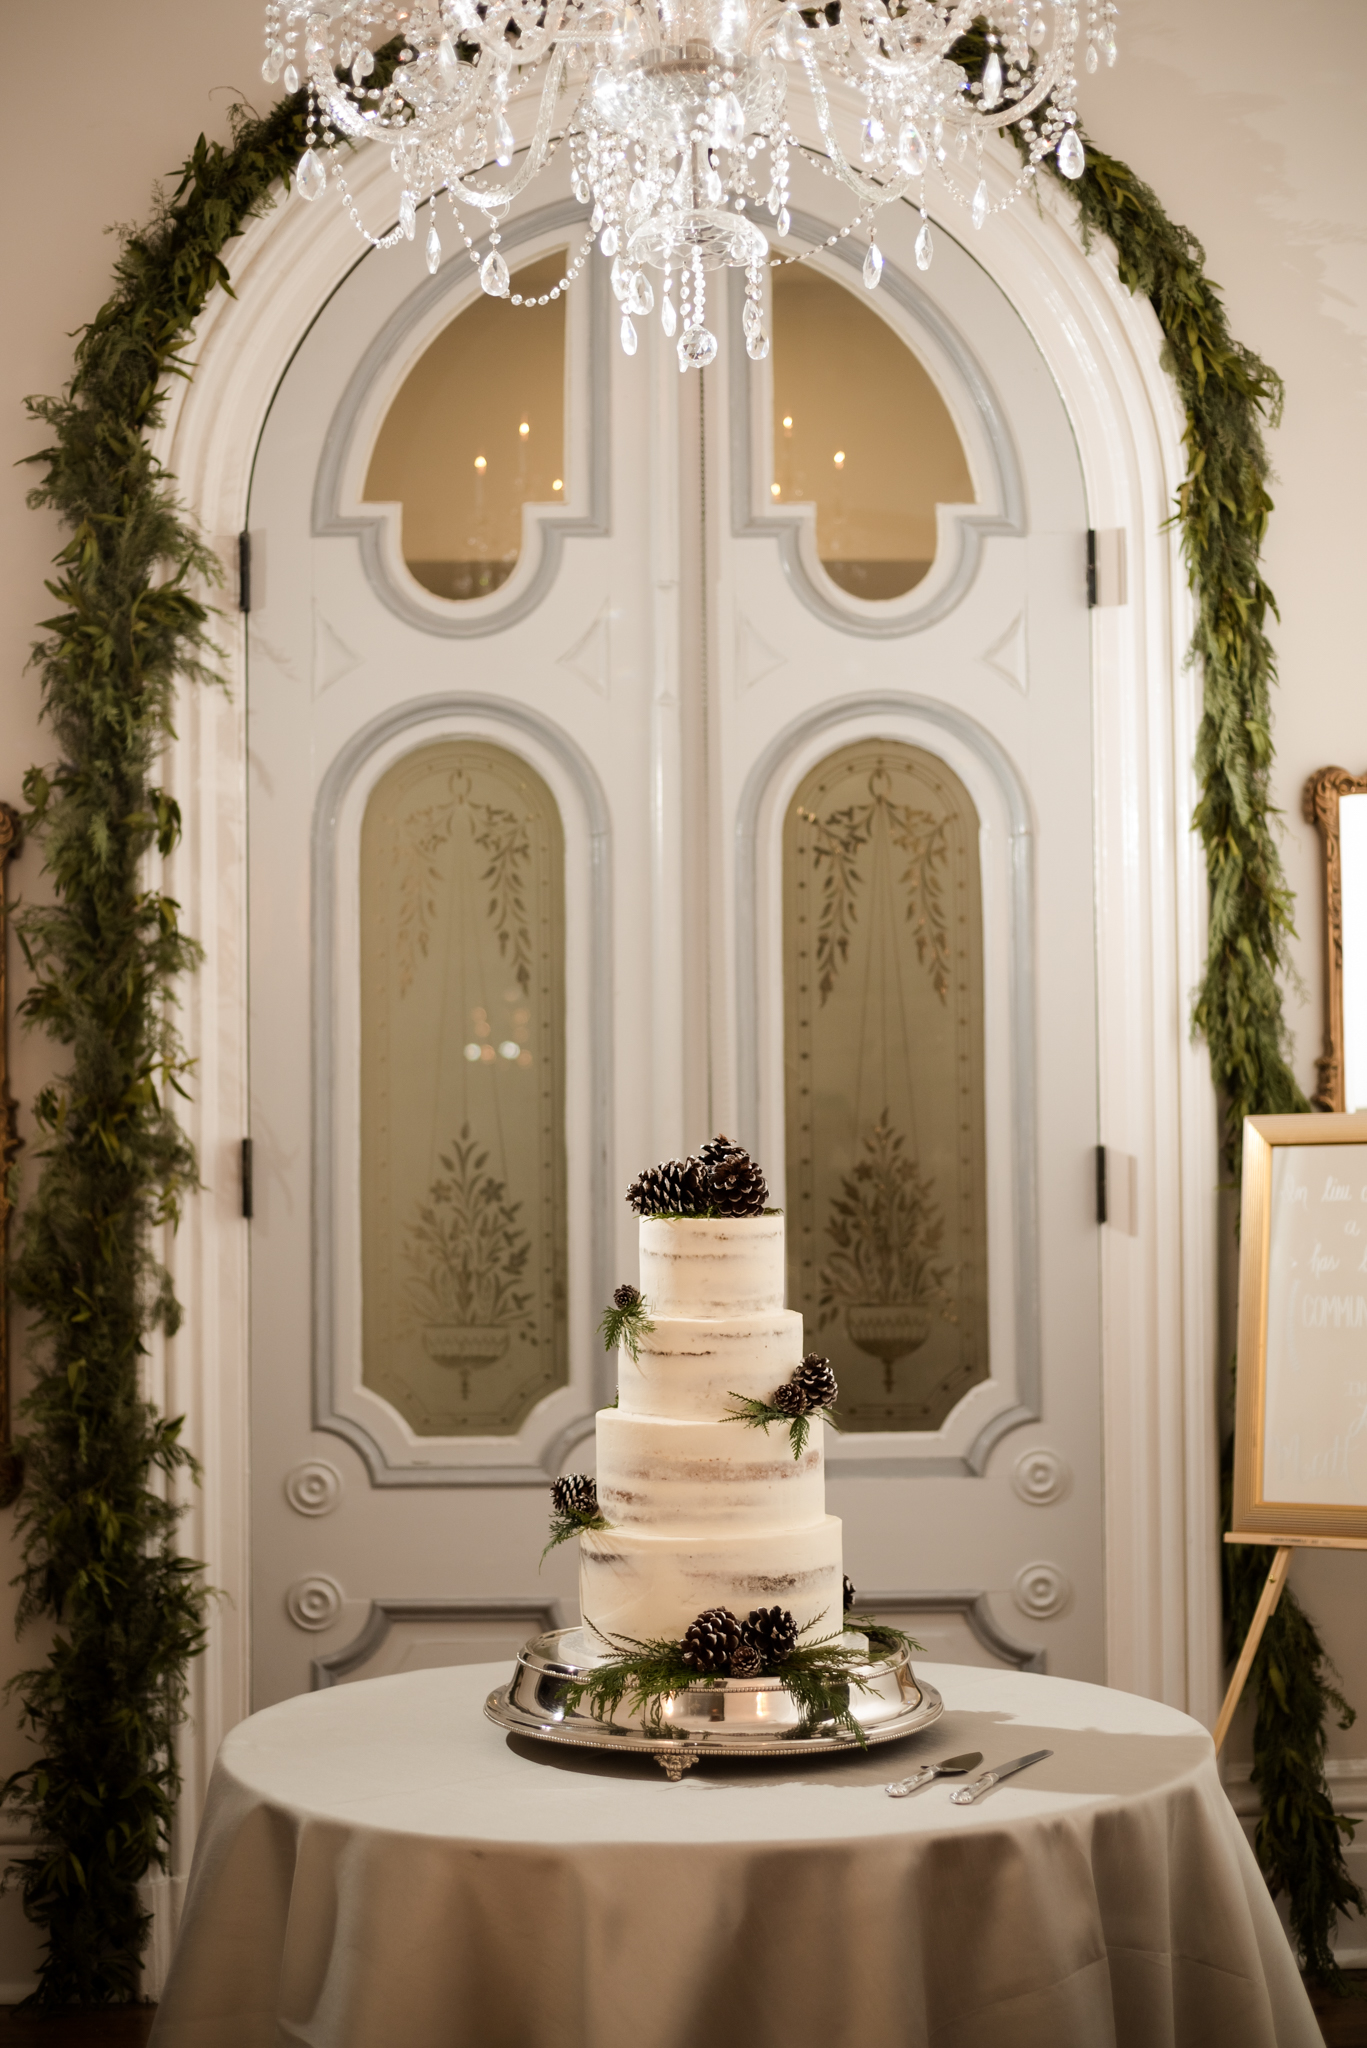 merrimon-wynne-wedding-photography-040.jpg